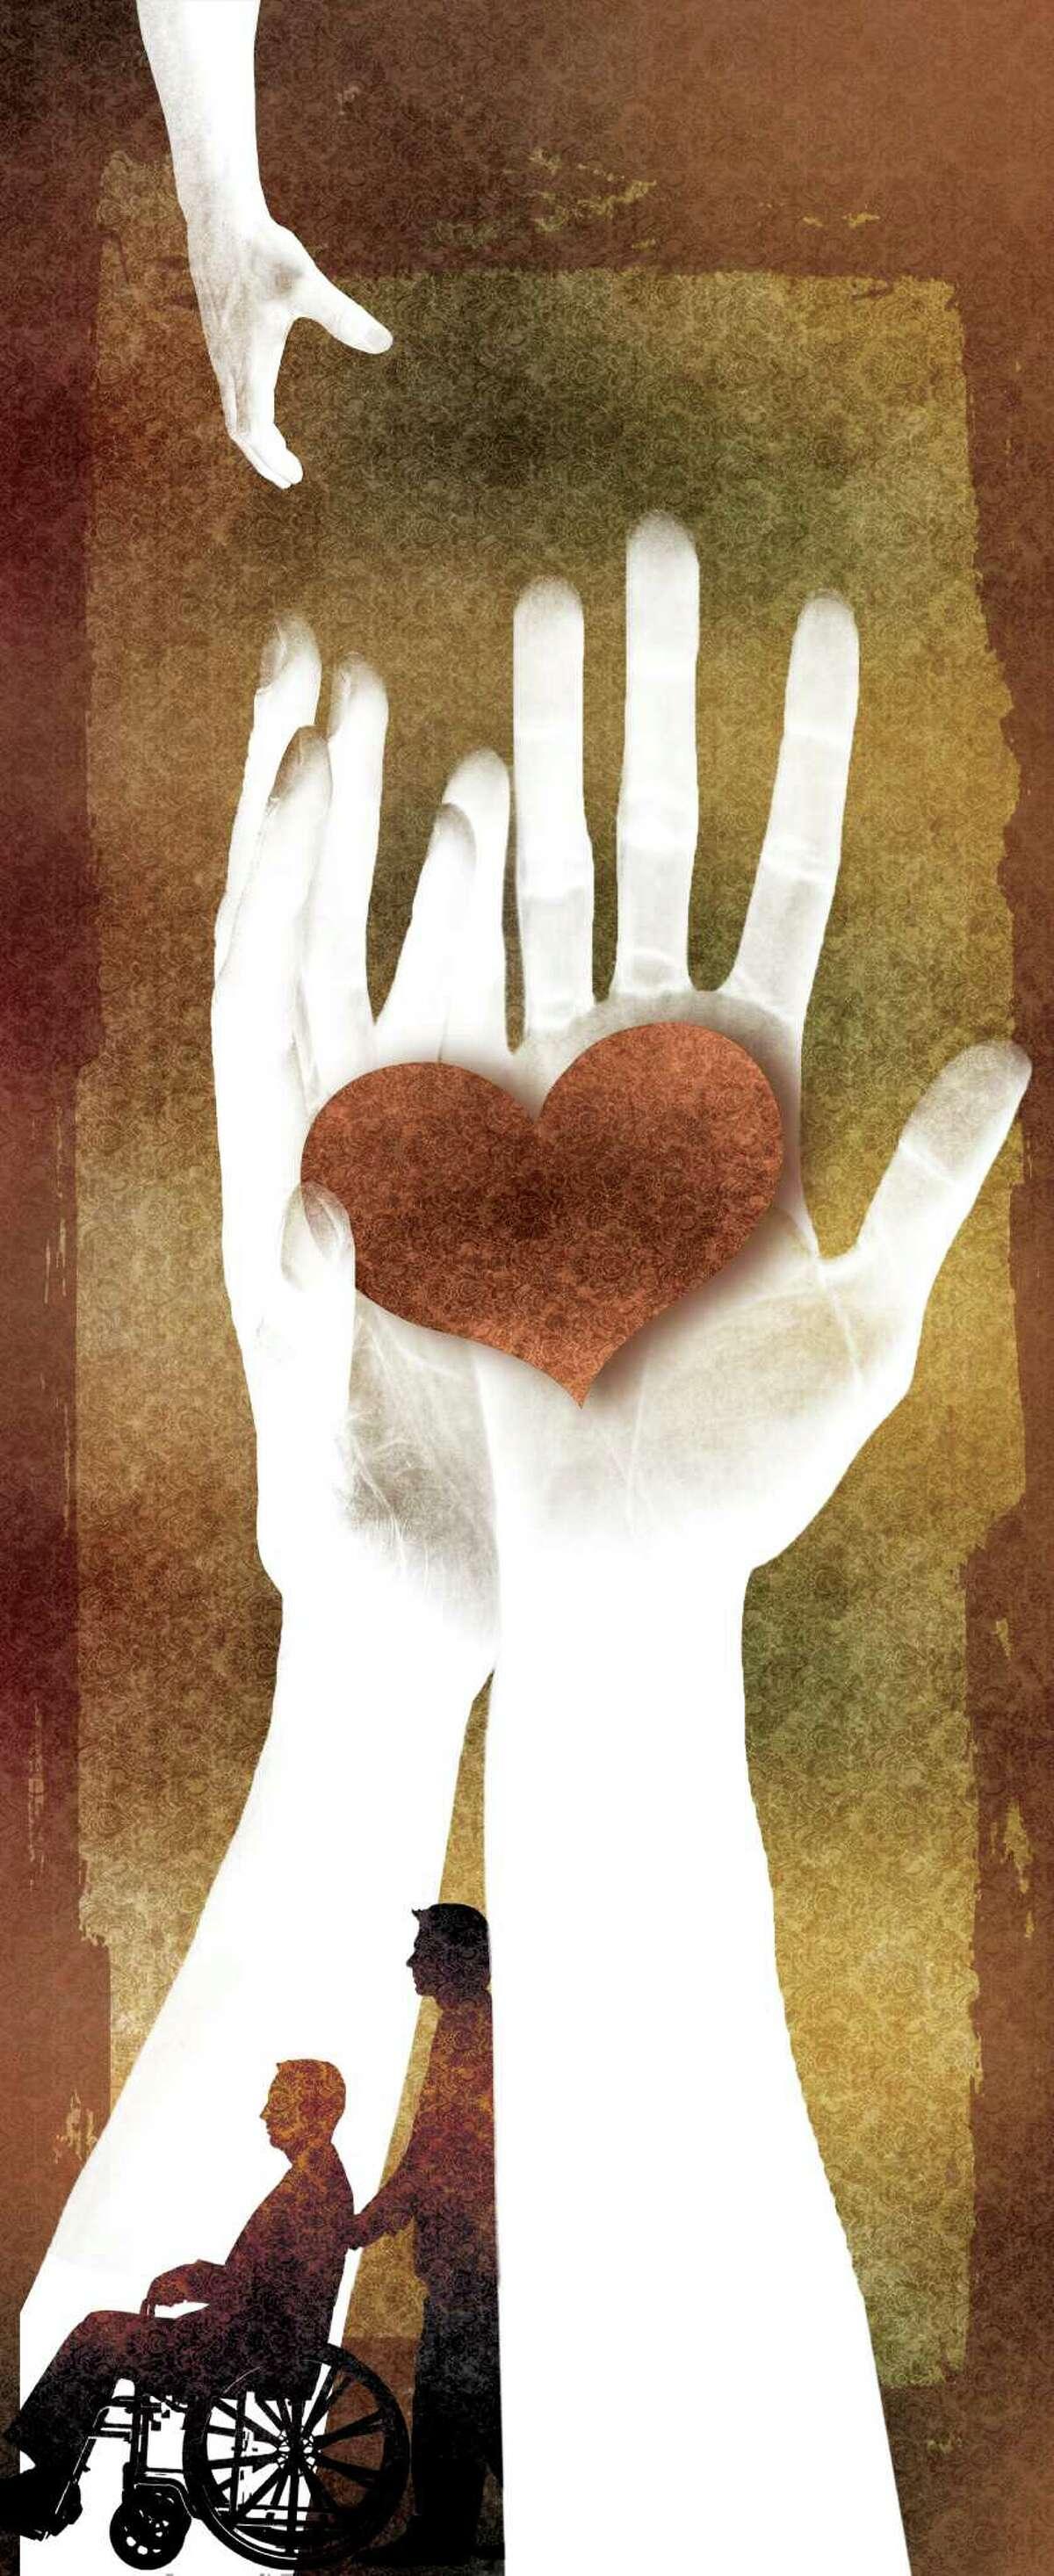 Compassion story mySA Monday 102913